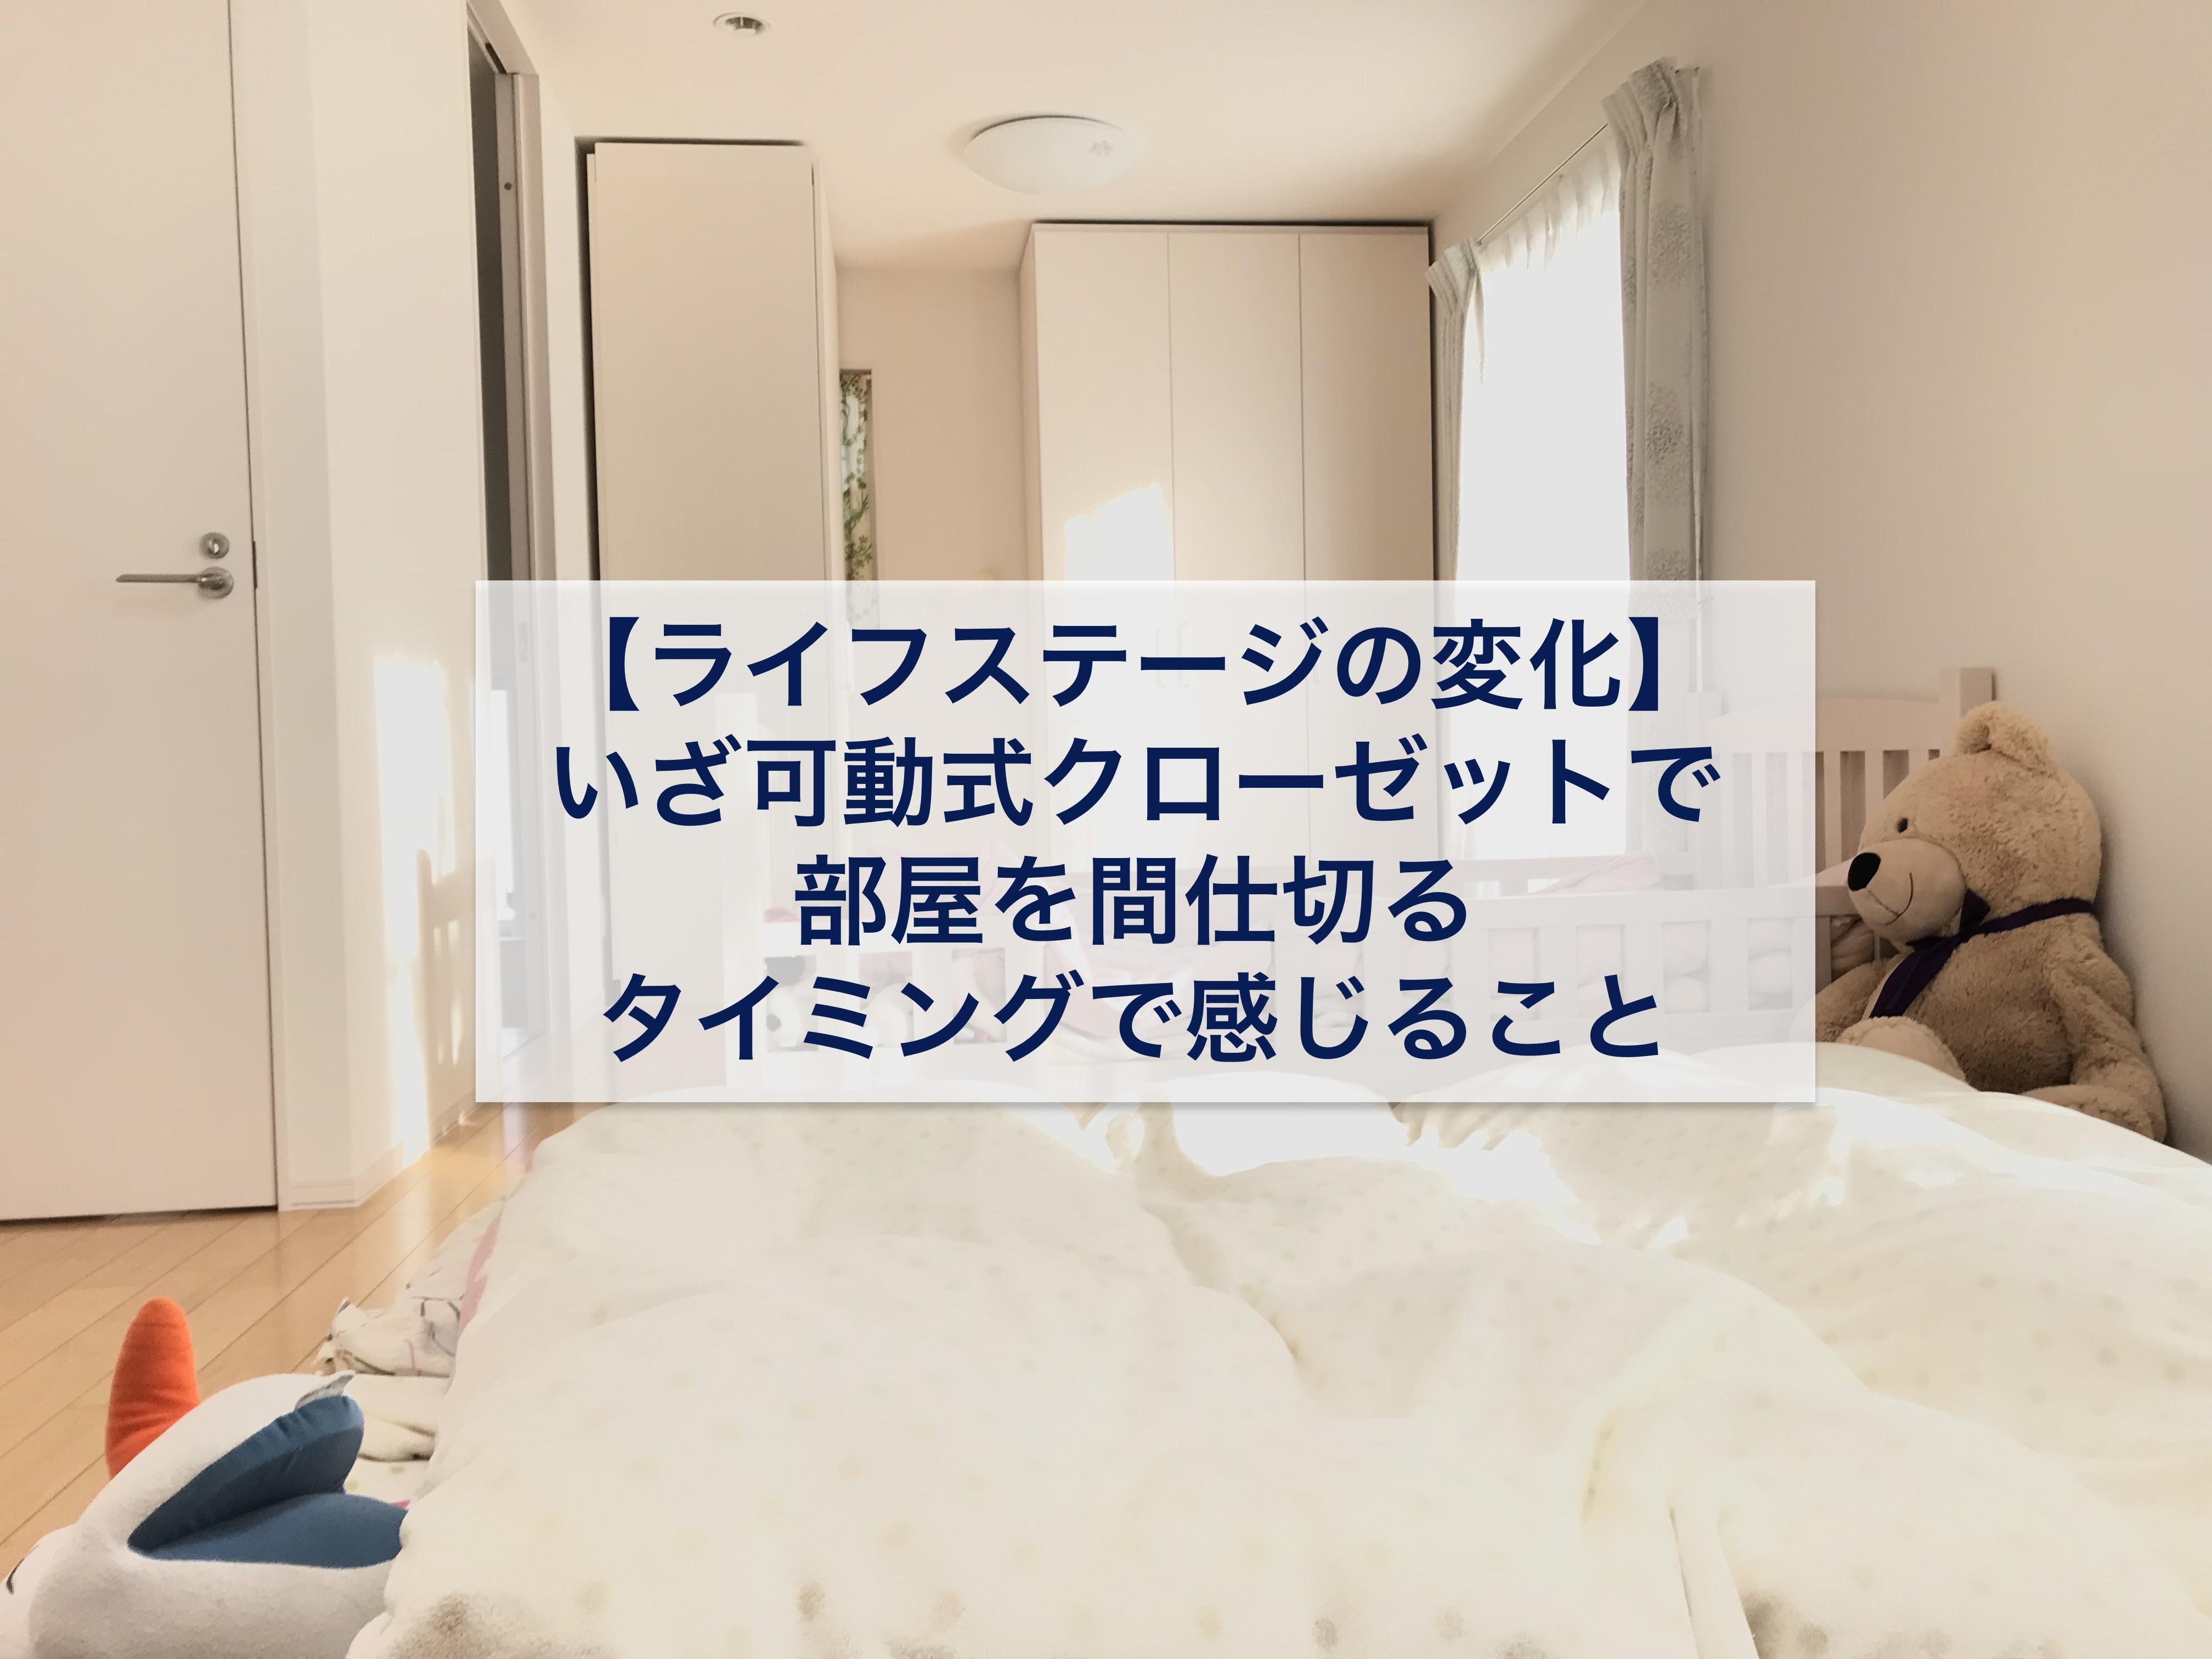 LIMIA掲載:可動式クローゼットで部屋を分けるメリットデメリット